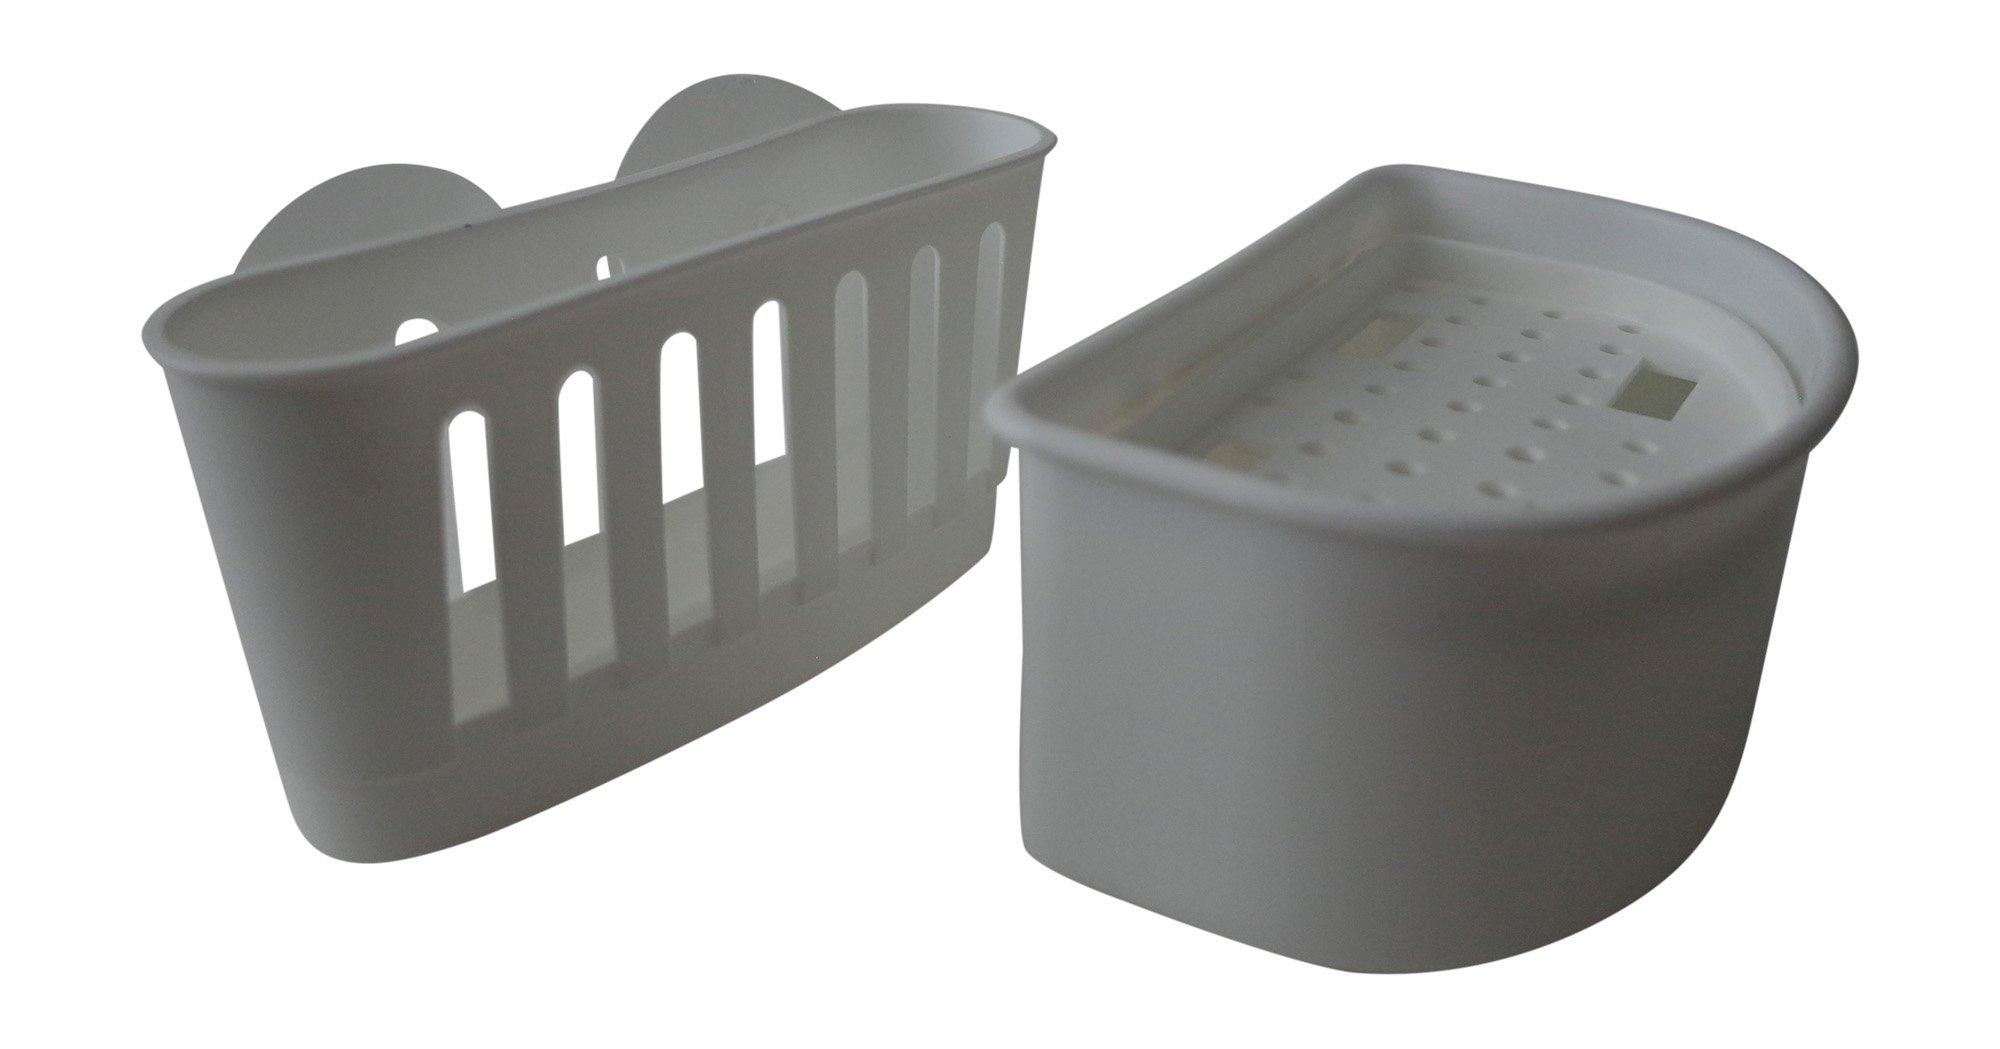 Sponge Holder Suction Caddy and Soap Dish Tray Kitchen and Bathroom Set, Plastic, Sink Caddy Kitchen Orgainization Dishwashing Liquid Drainer Rack Bottle Brush Scrubber Storage (White)